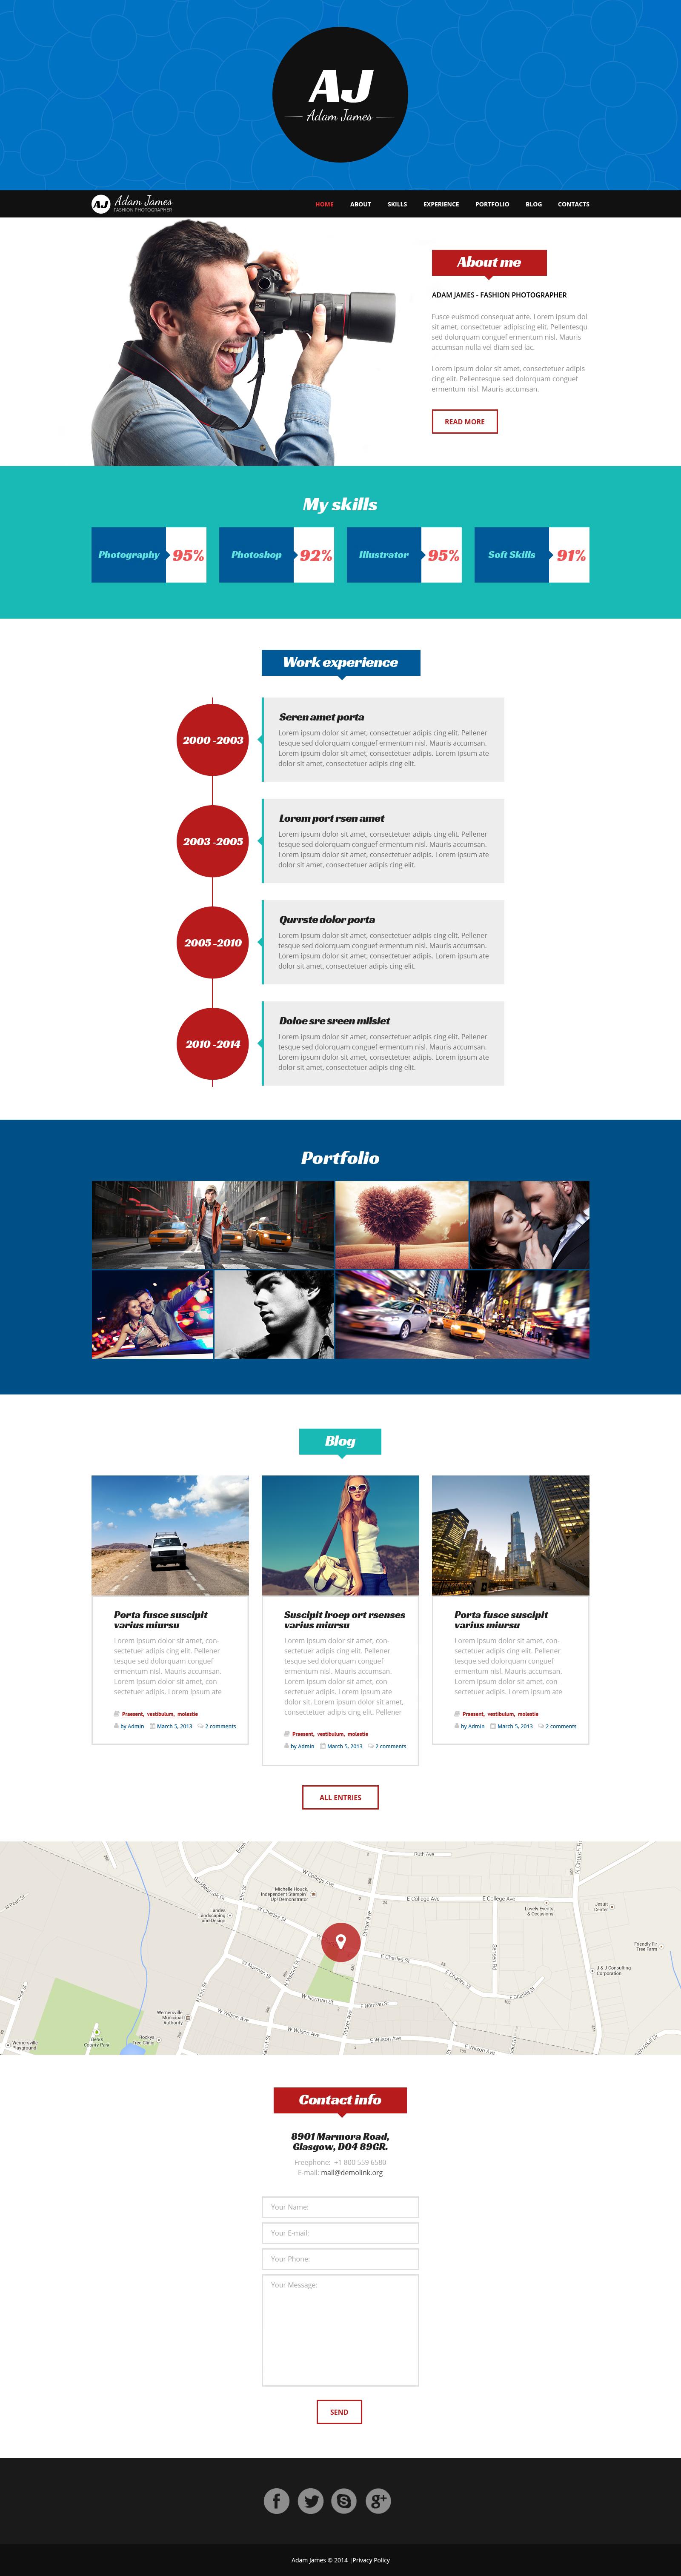 Page of Fashion Photographer WordPress Theme - screenshot